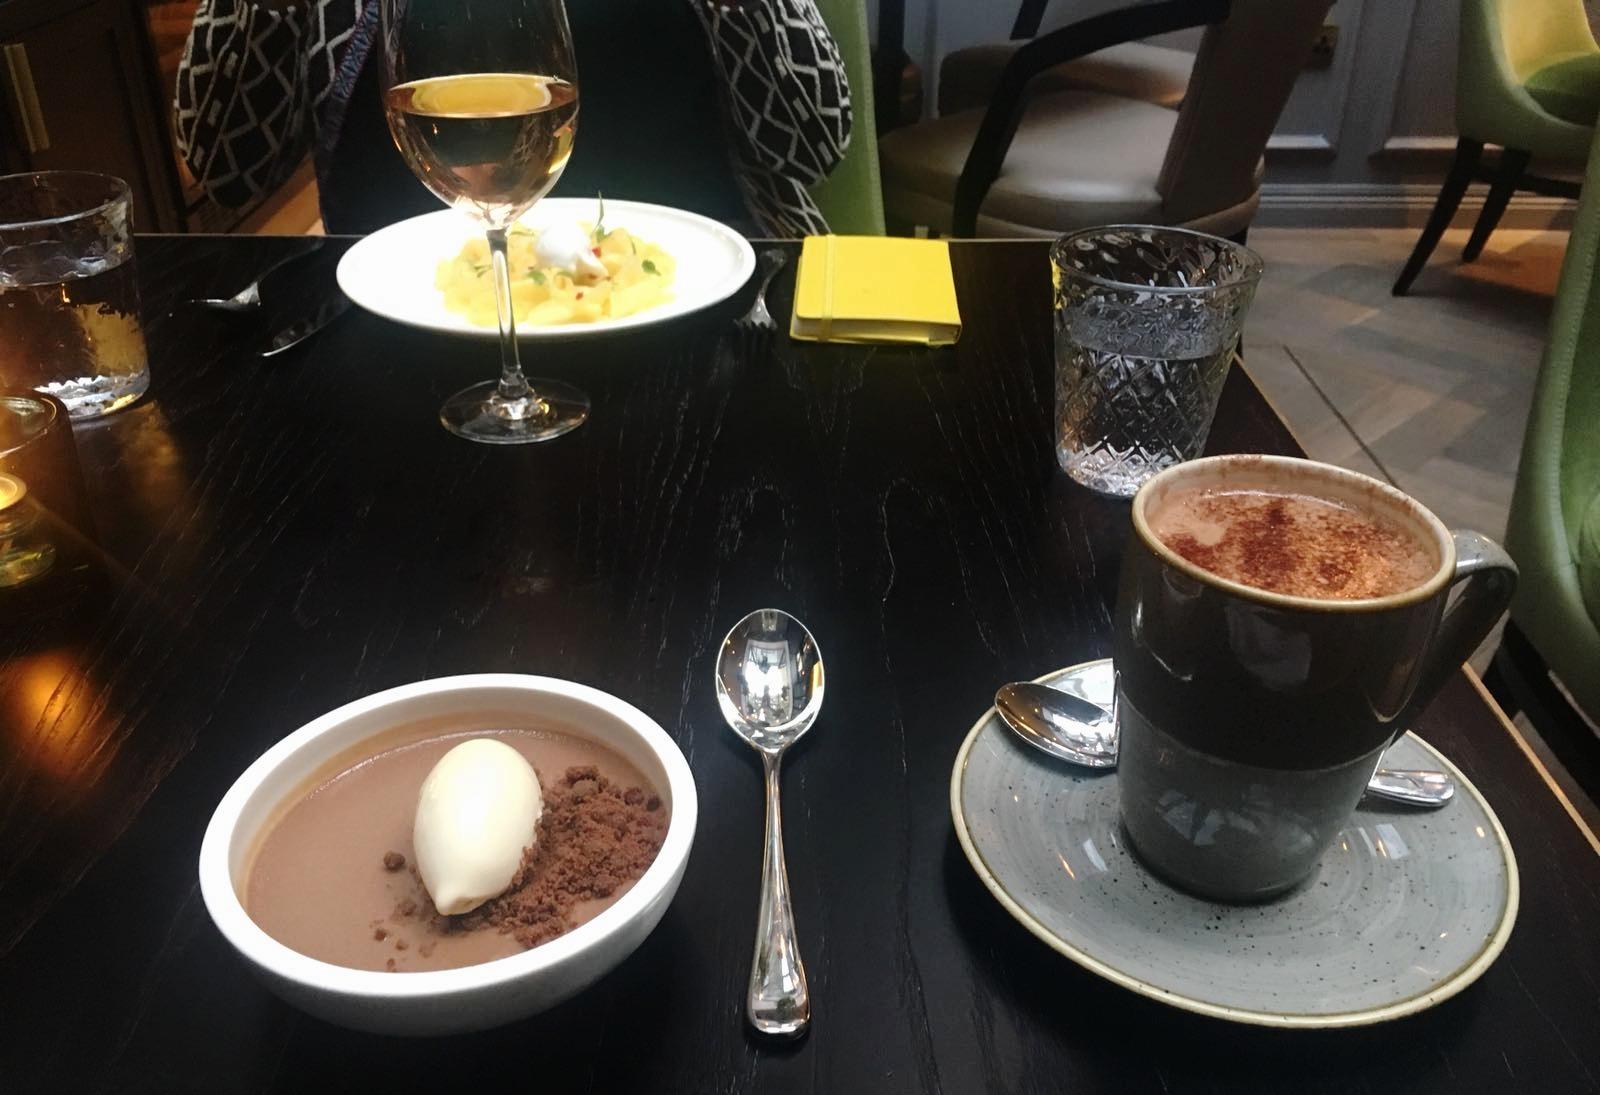 Salted caramel chocolate pot with vanilla ice cream and Avocado Soane Hot Chocolate